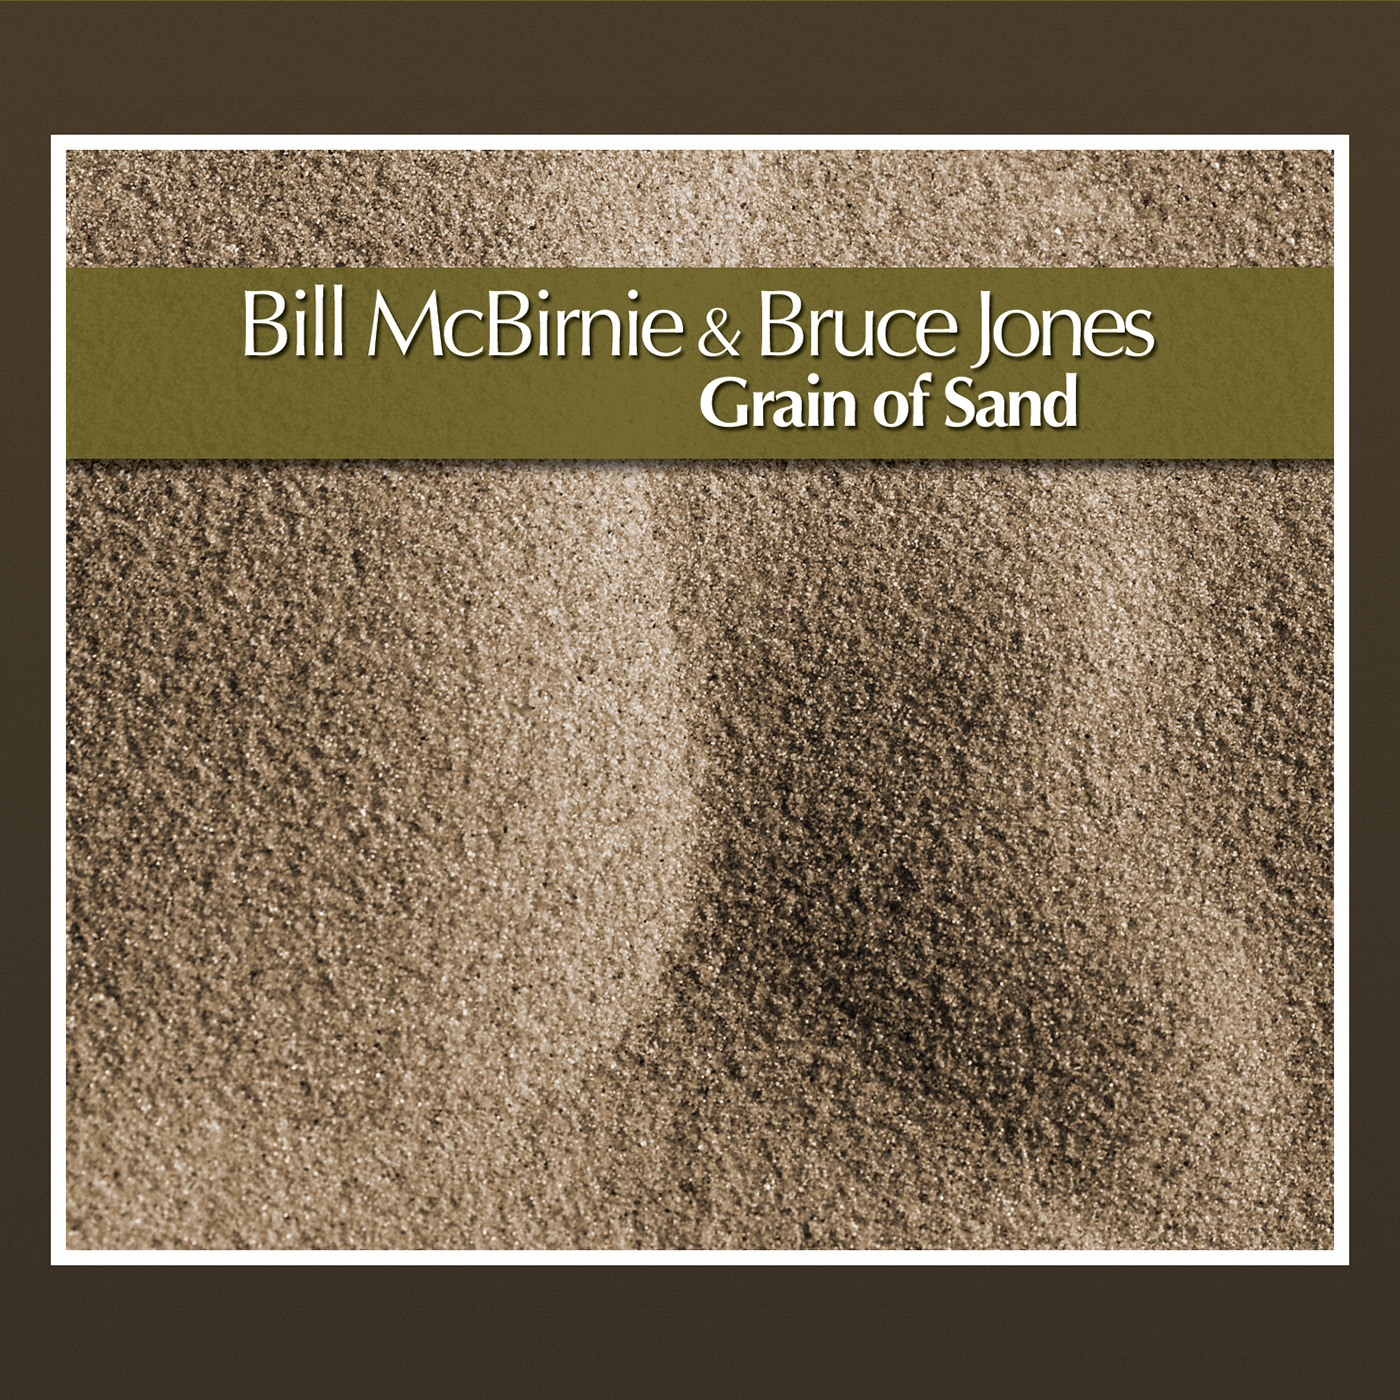 Grain of Sand (Bill McBirnie & Bruce Jones)